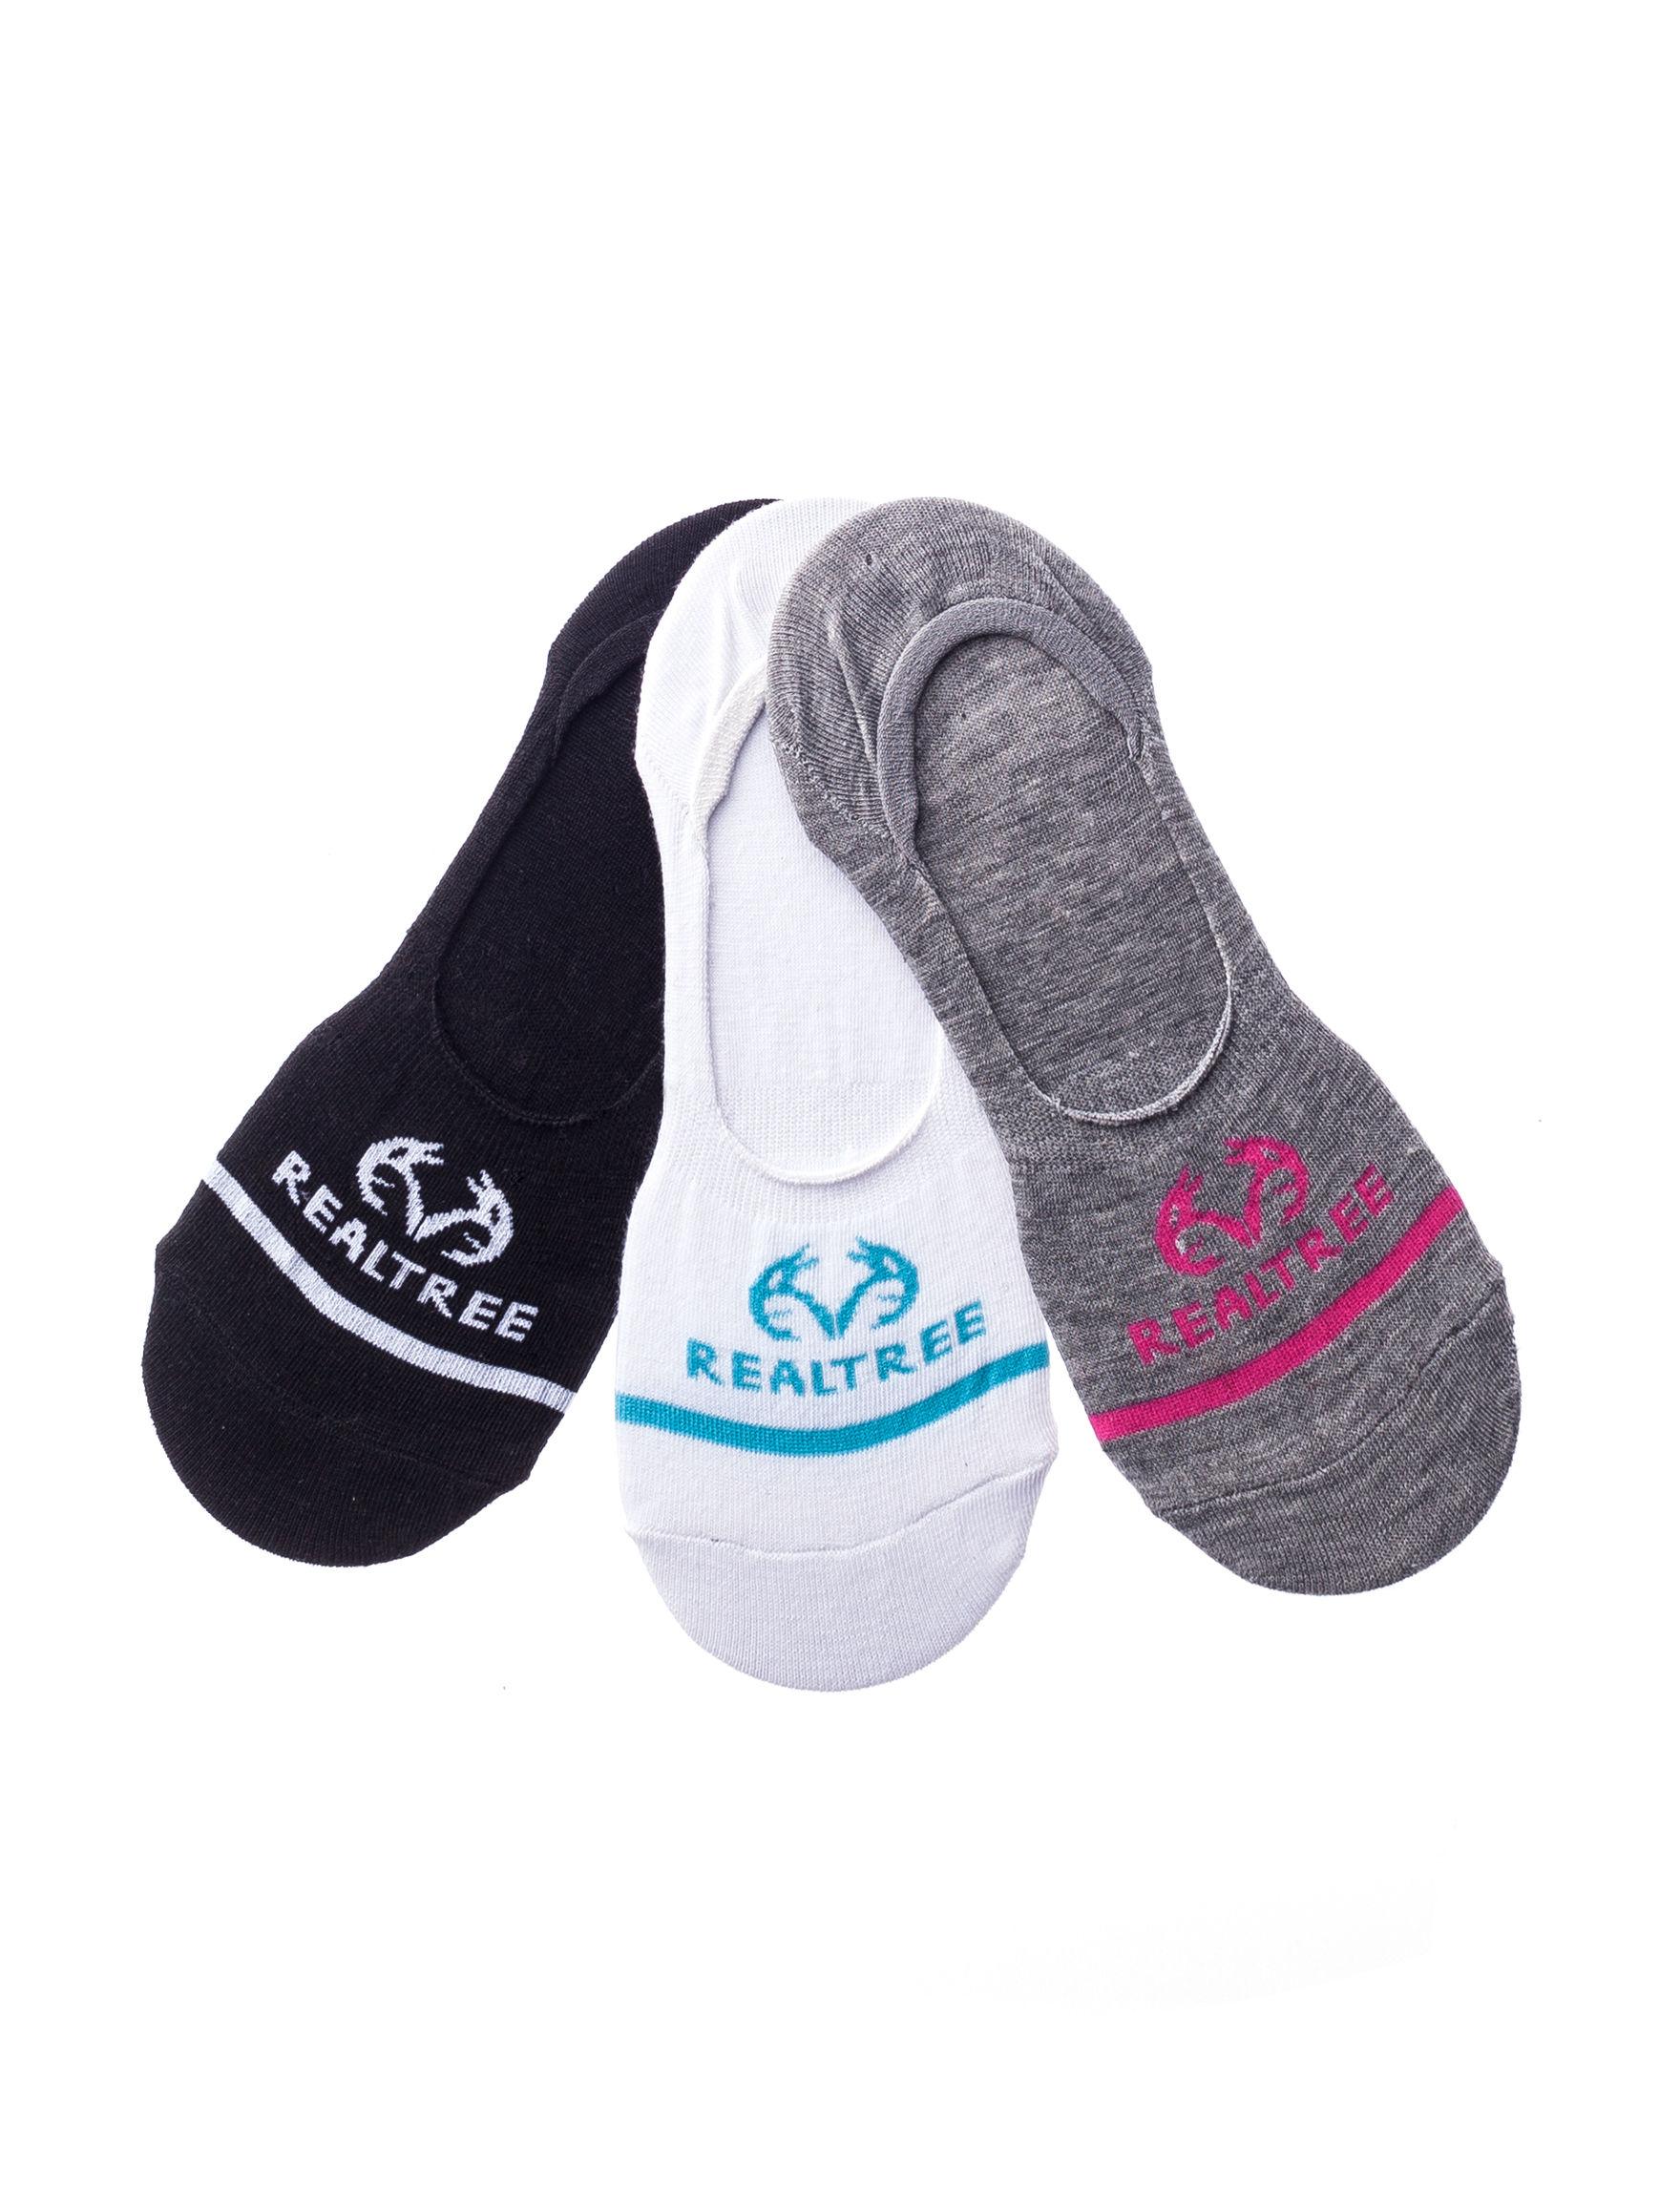 Realtree Grey Socks